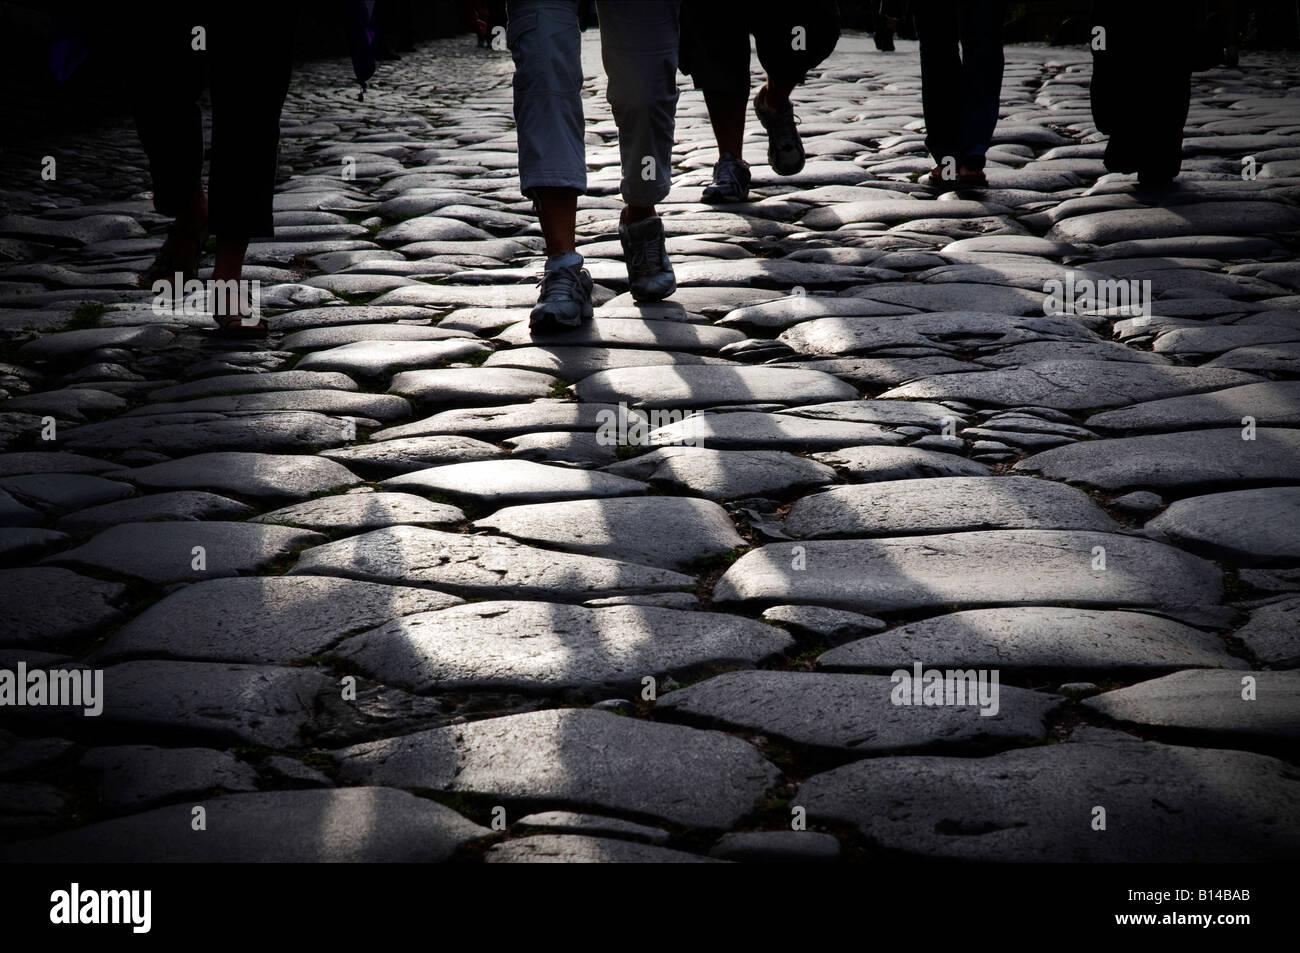 Via Sacra, an ancient road near the Colosseum, Rome - Stock Image